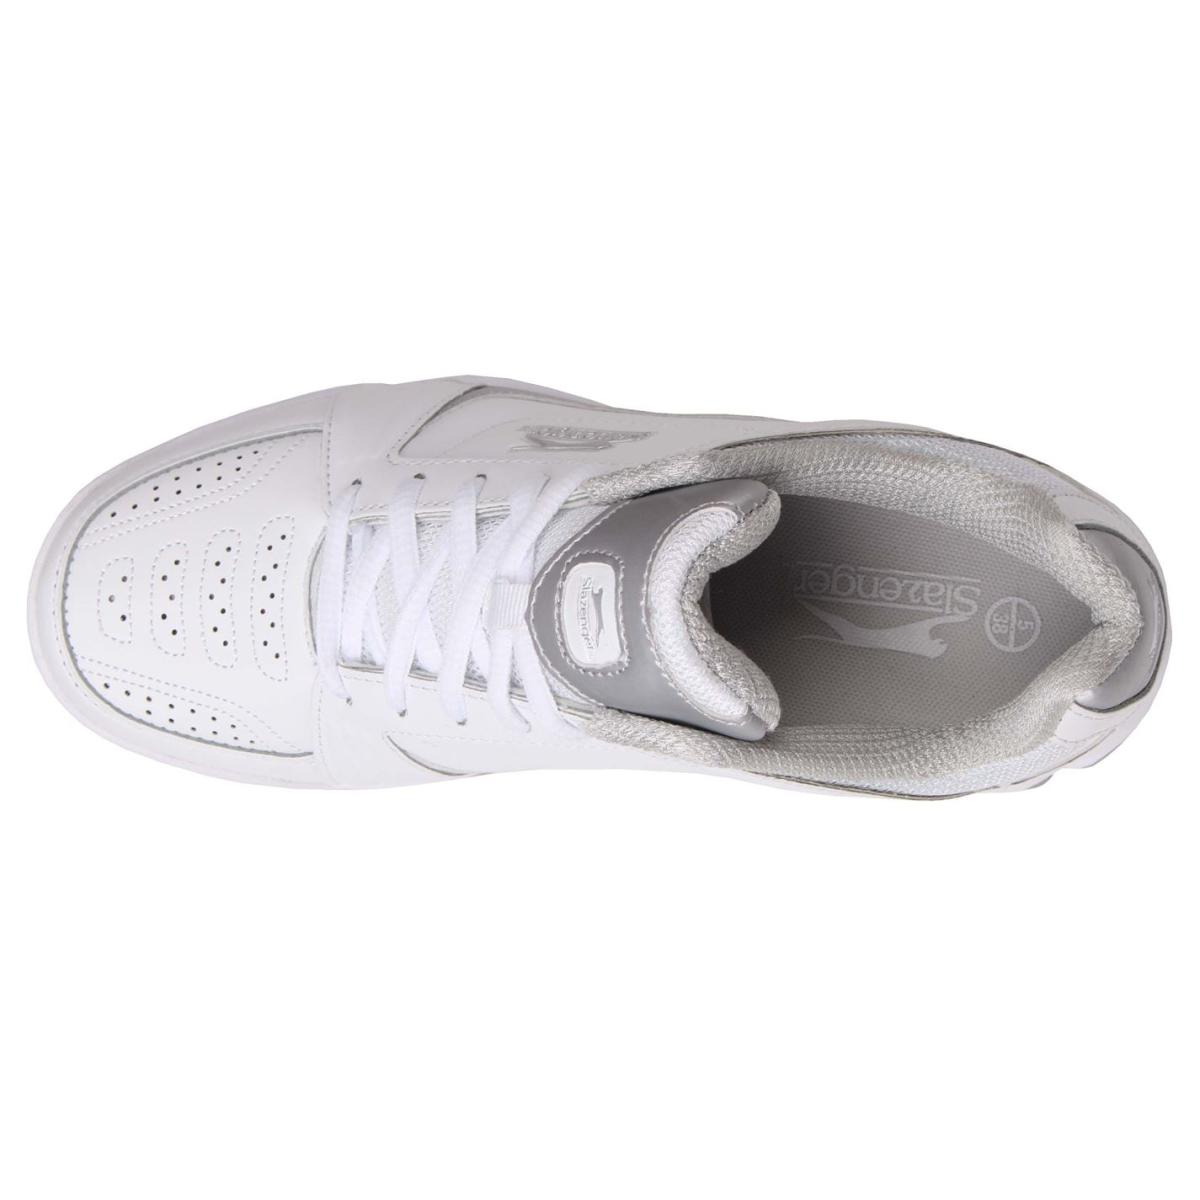 Slazenger-Turnschuhe-Laufschuhe-Damen-Sportschuhe-Sneakers-Lifestyle-6118 Indexbild 4